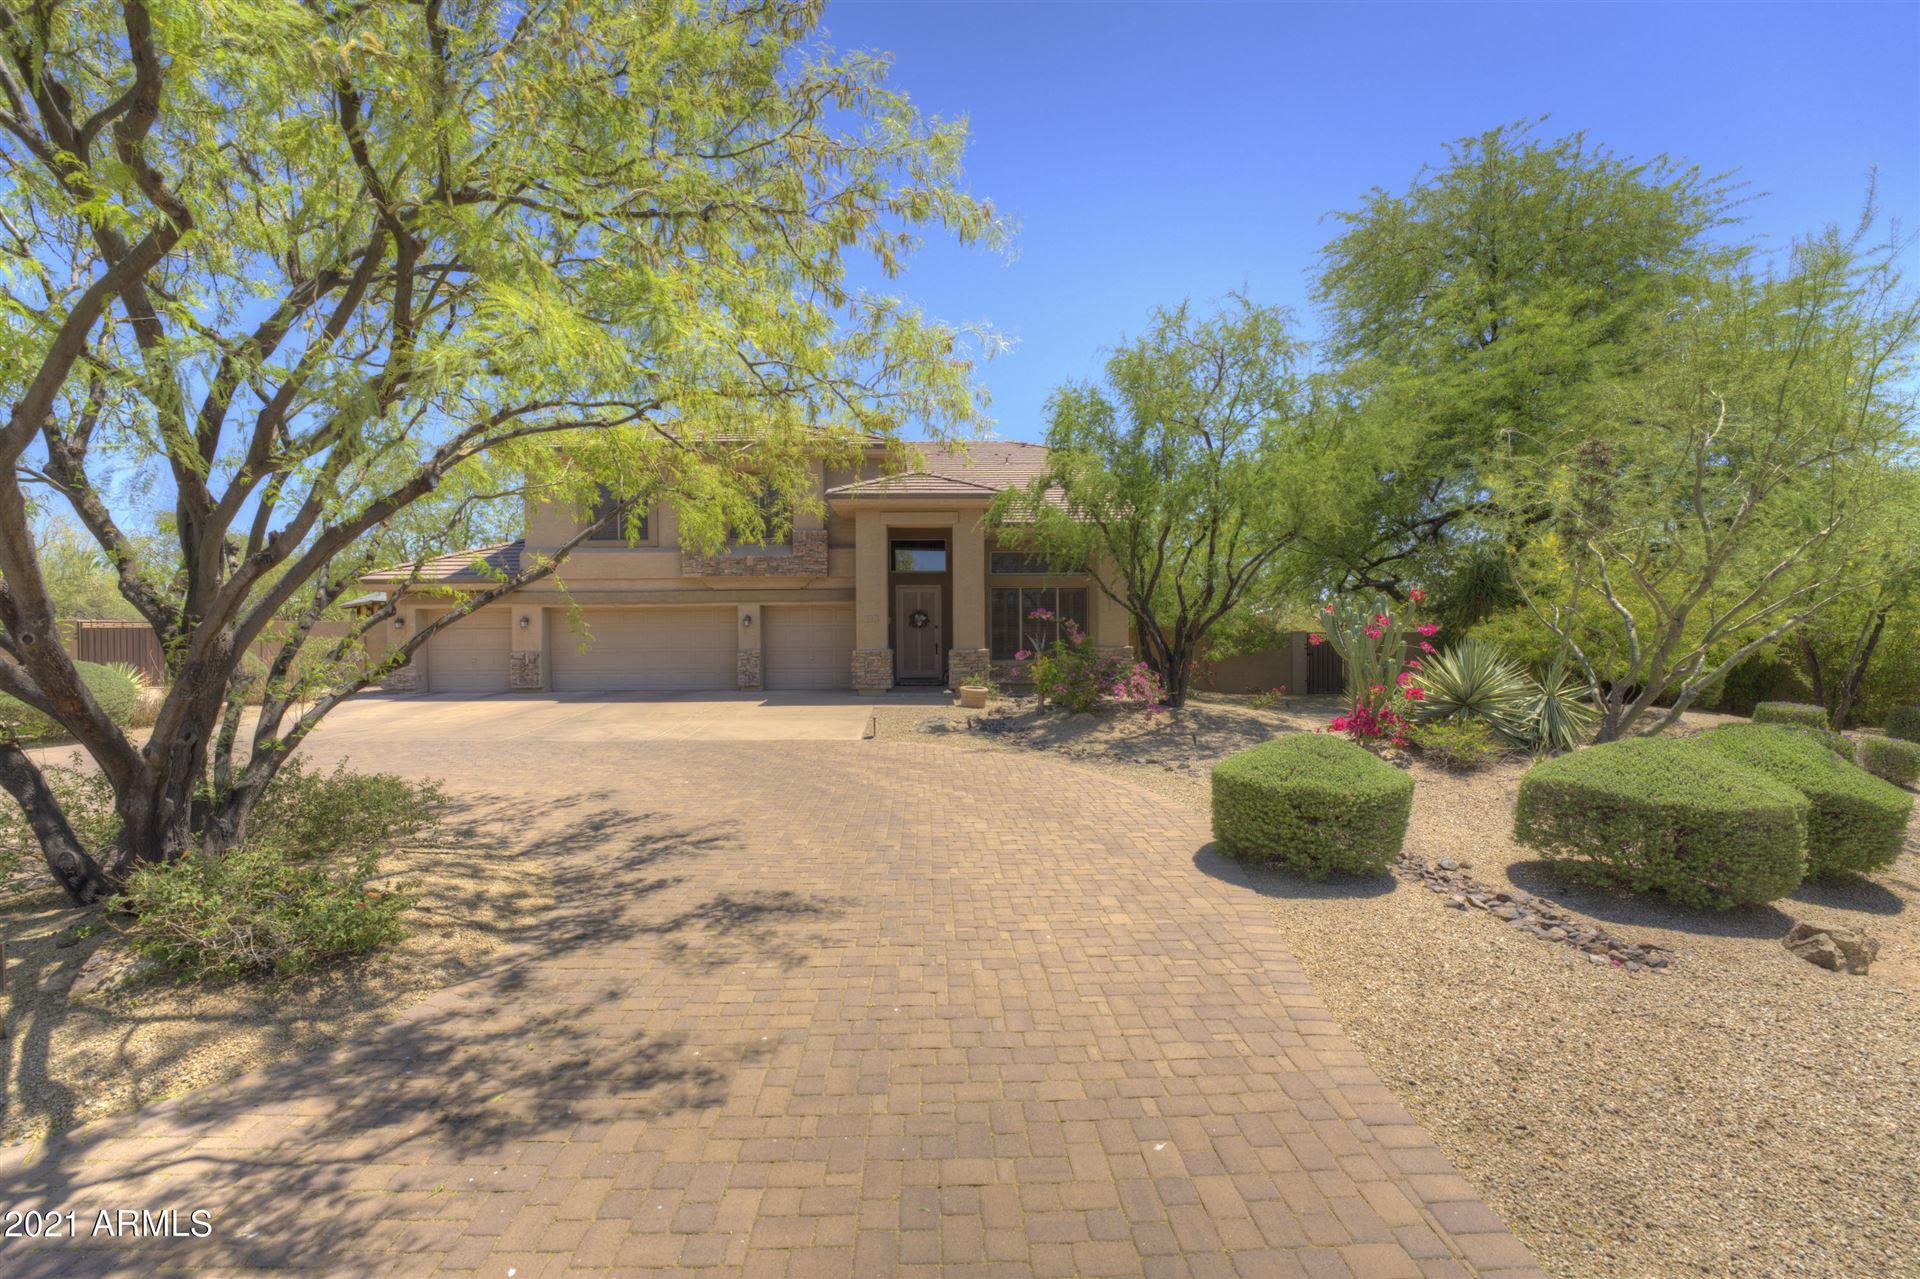 31511 N 48TH Street, Cave Creek, AZ 85331 - MLS#: 6230221